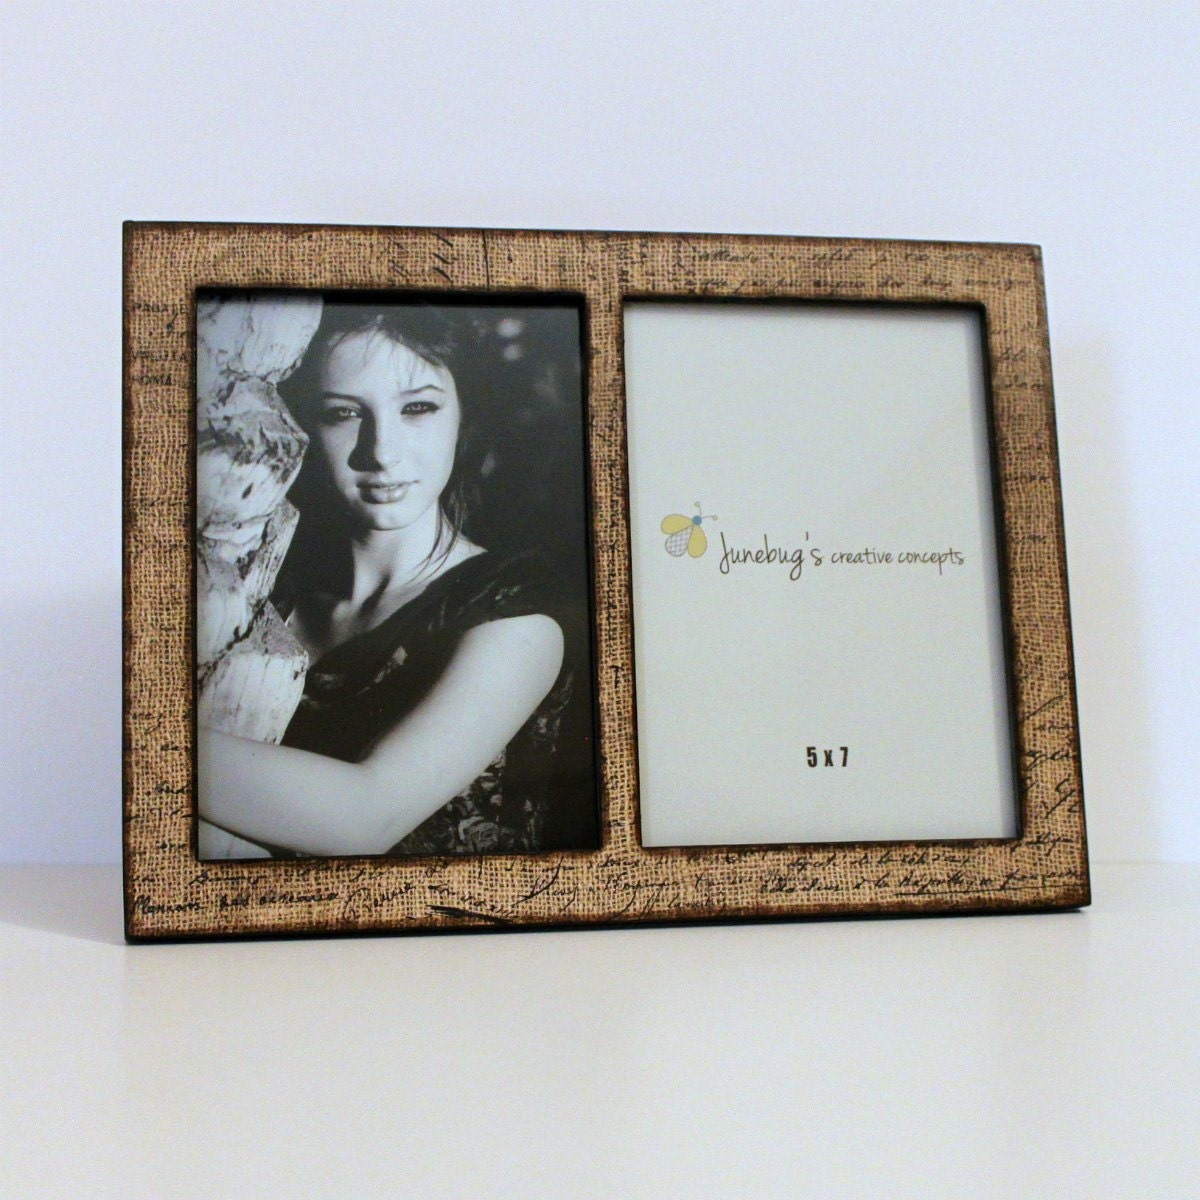 double 4x6 or 5x7 wood picture frame parisian burlap by junebugscc. Black Bedroom Furniture Sets. Home Design Ideas